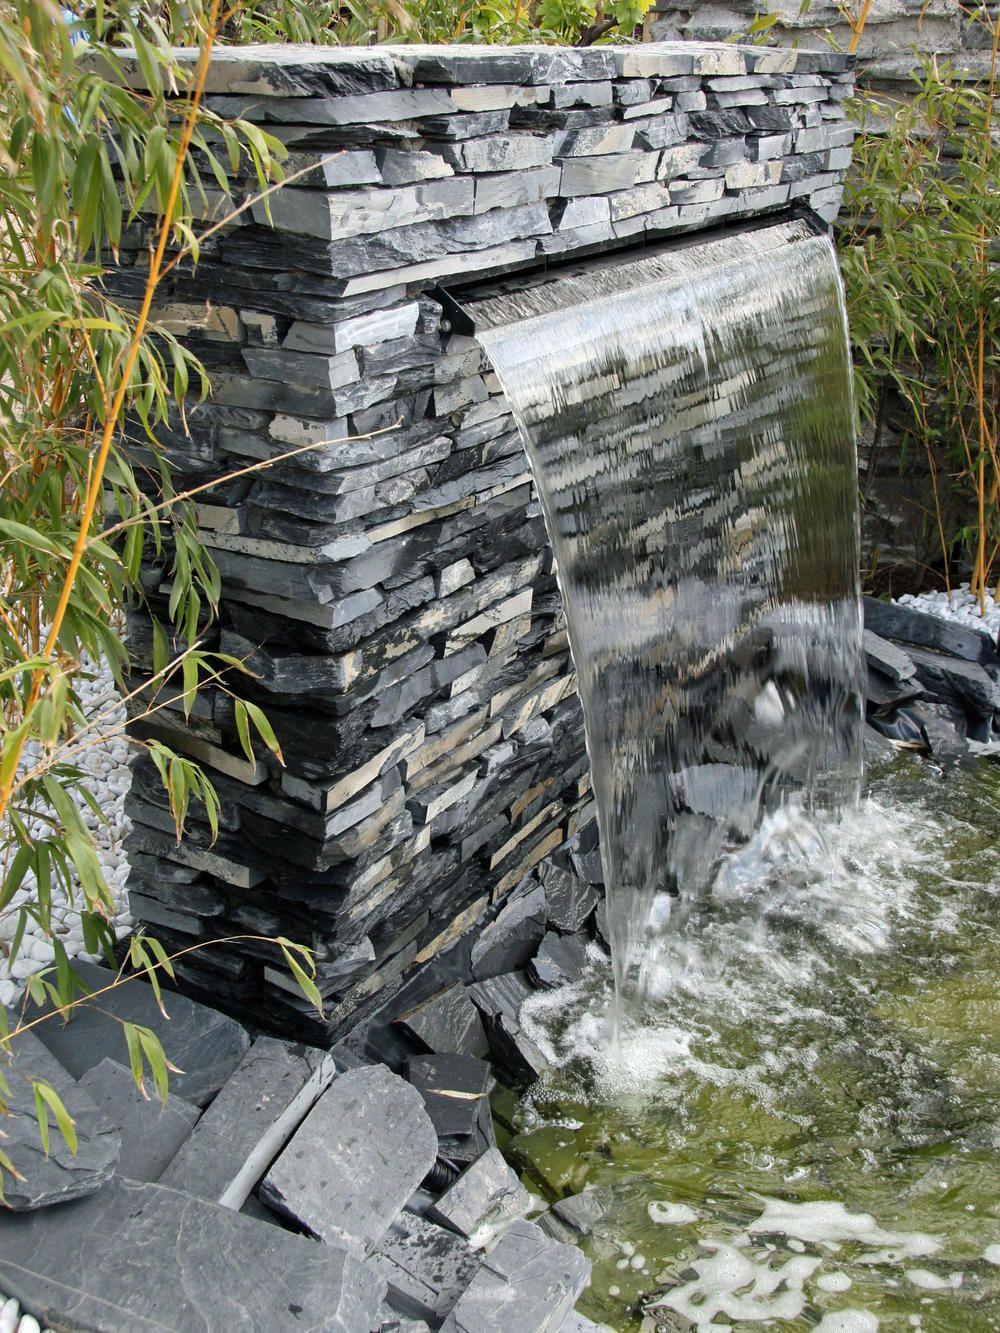 Wasserfall Im Garten Selber Bauen Wasserfall Garten Natursteine Garten Brunnen Garten